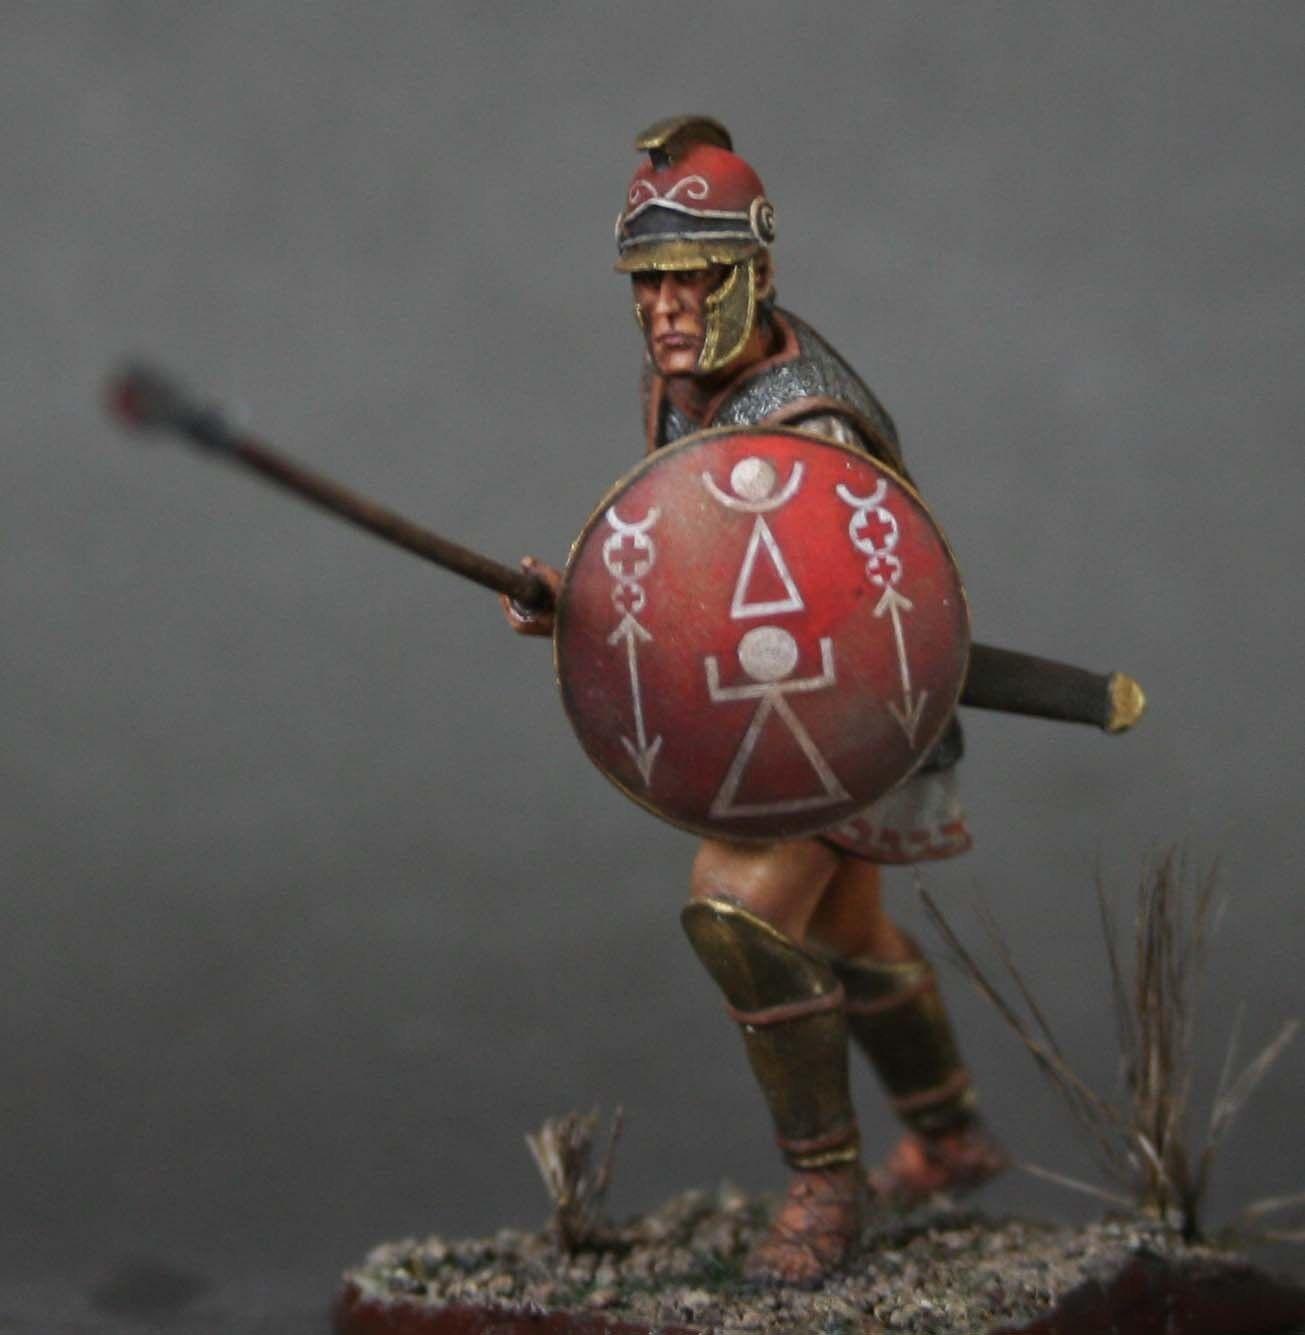 Tin Soldier, konst, liby -phoenisk infanterist {rea -5533;65533; 65533; 1, hopplit, Kkonsthage, 54 mm